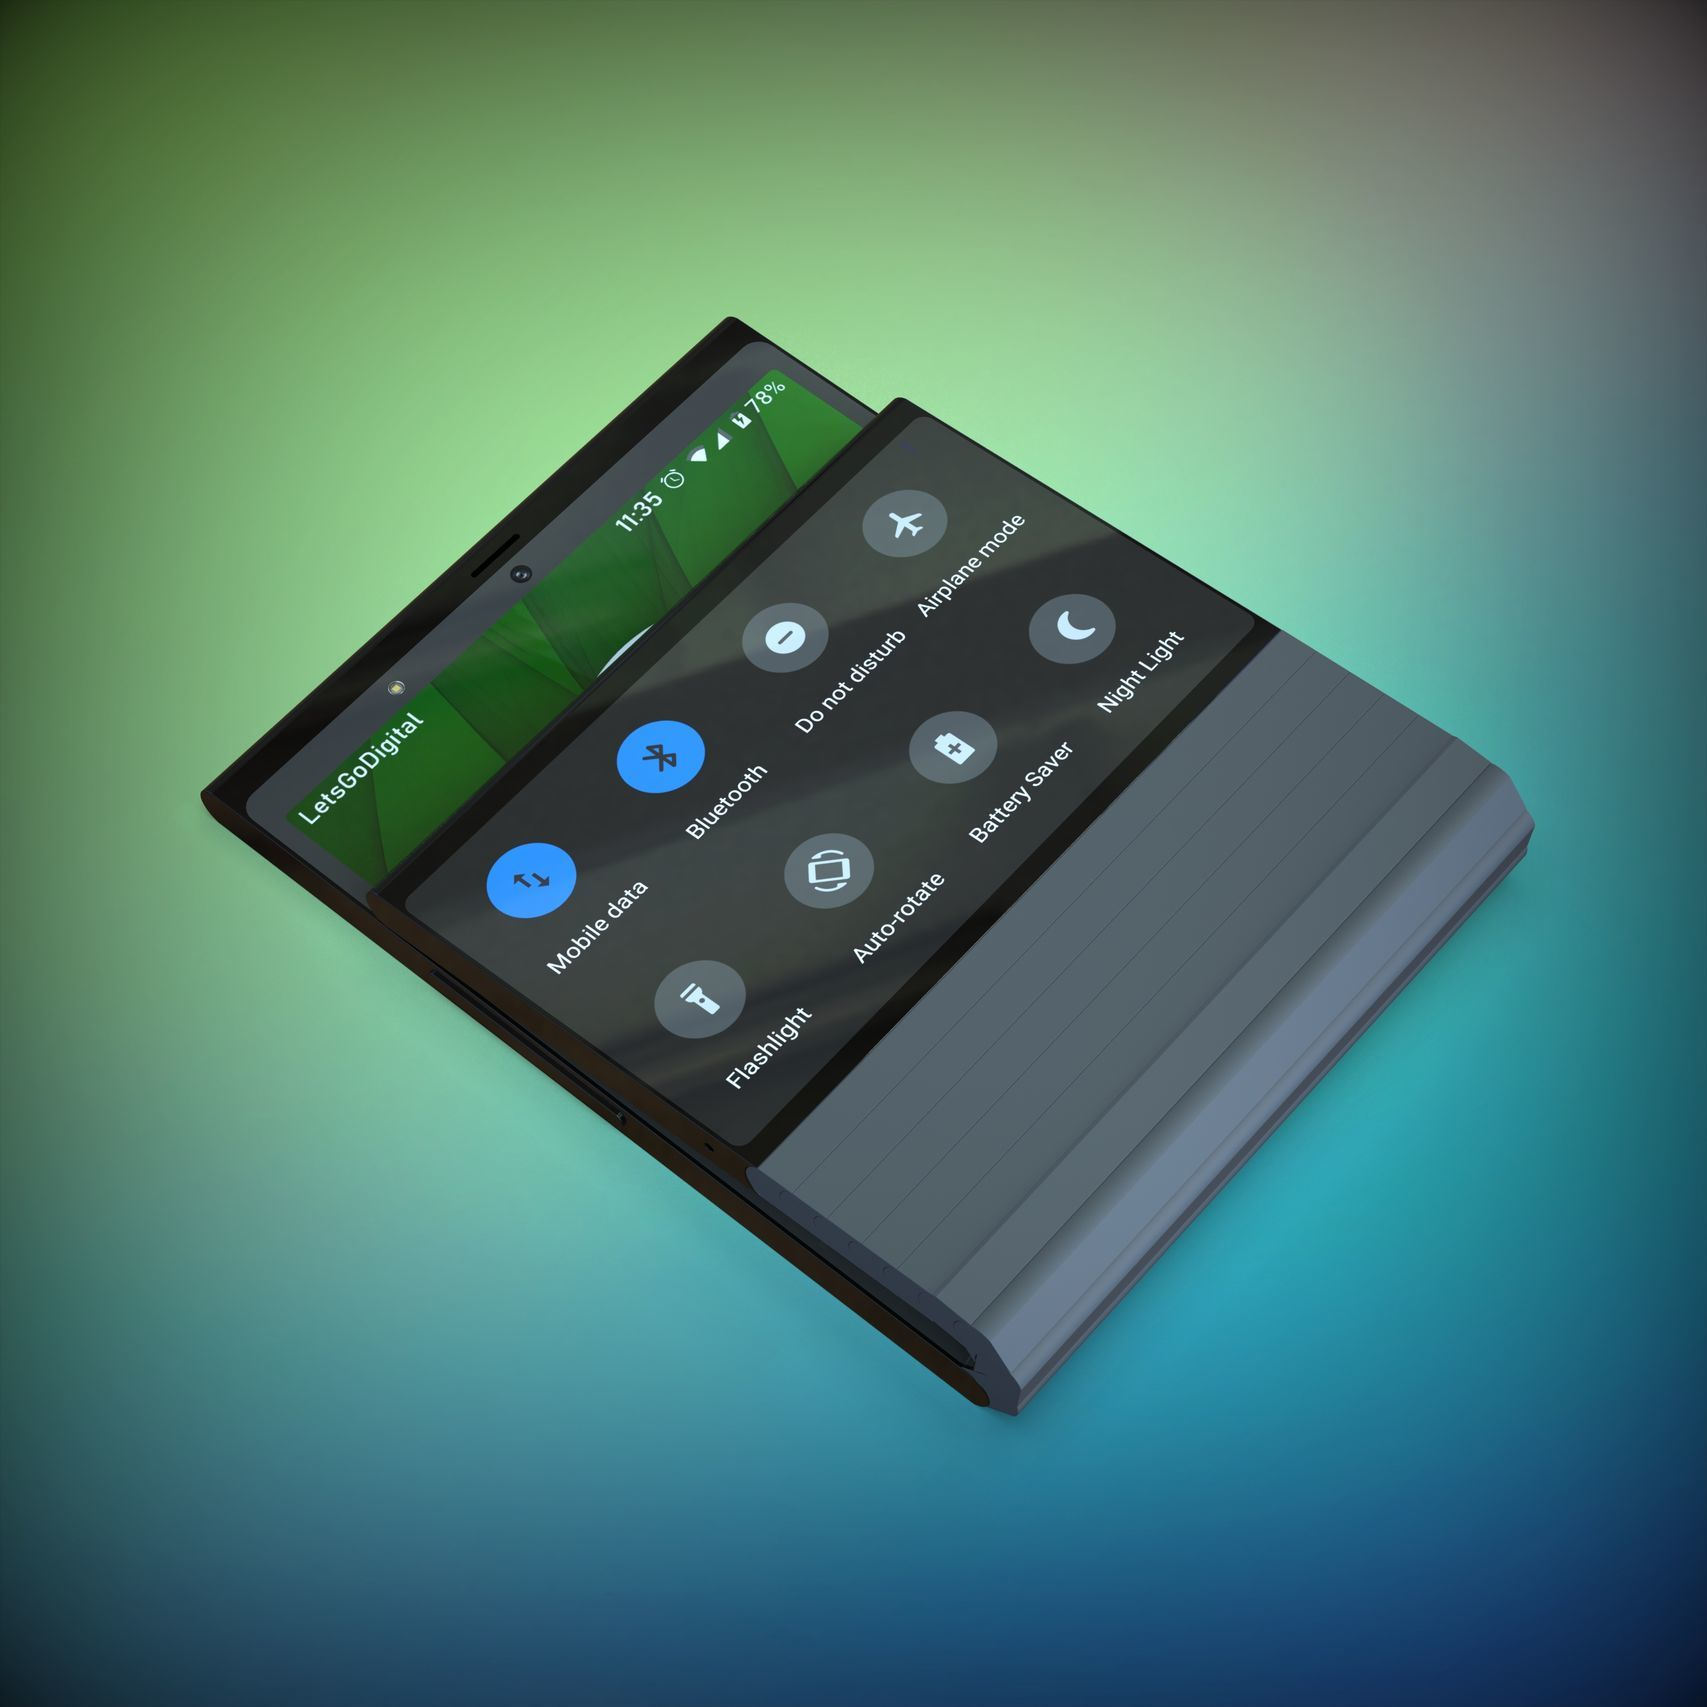 Lenovo patent ohebný telefon